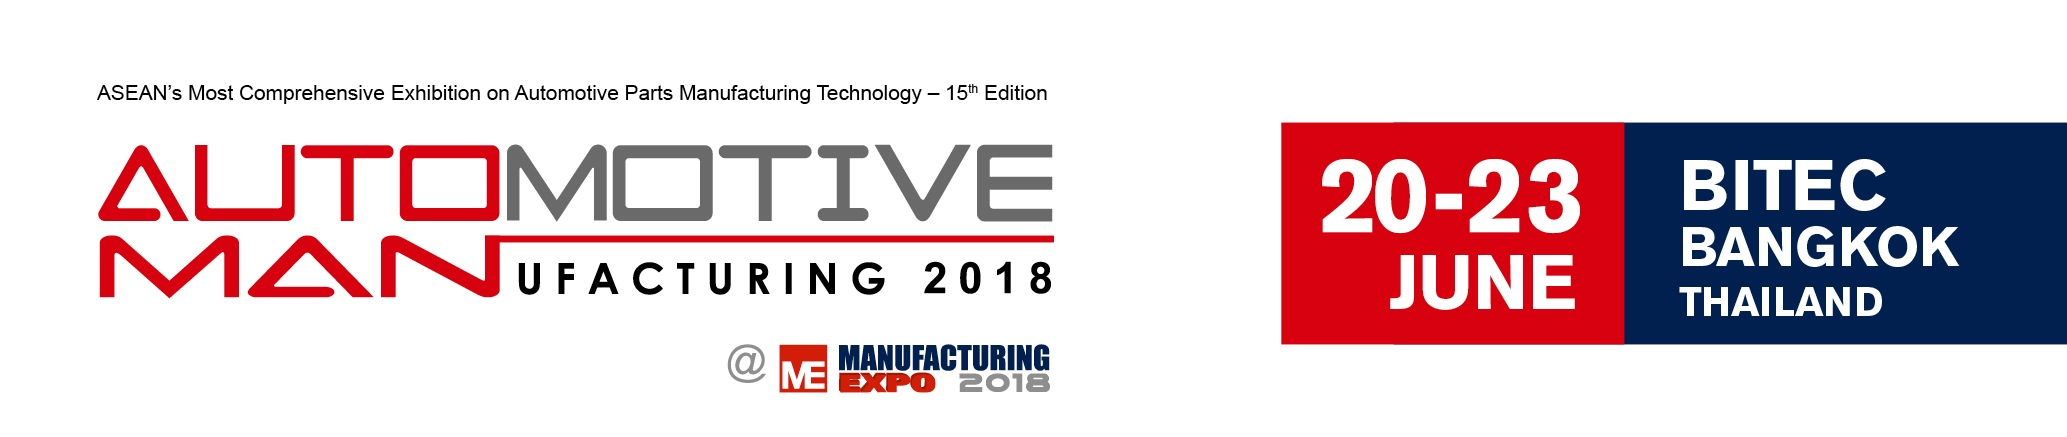 Automotive Manufacturing 2018